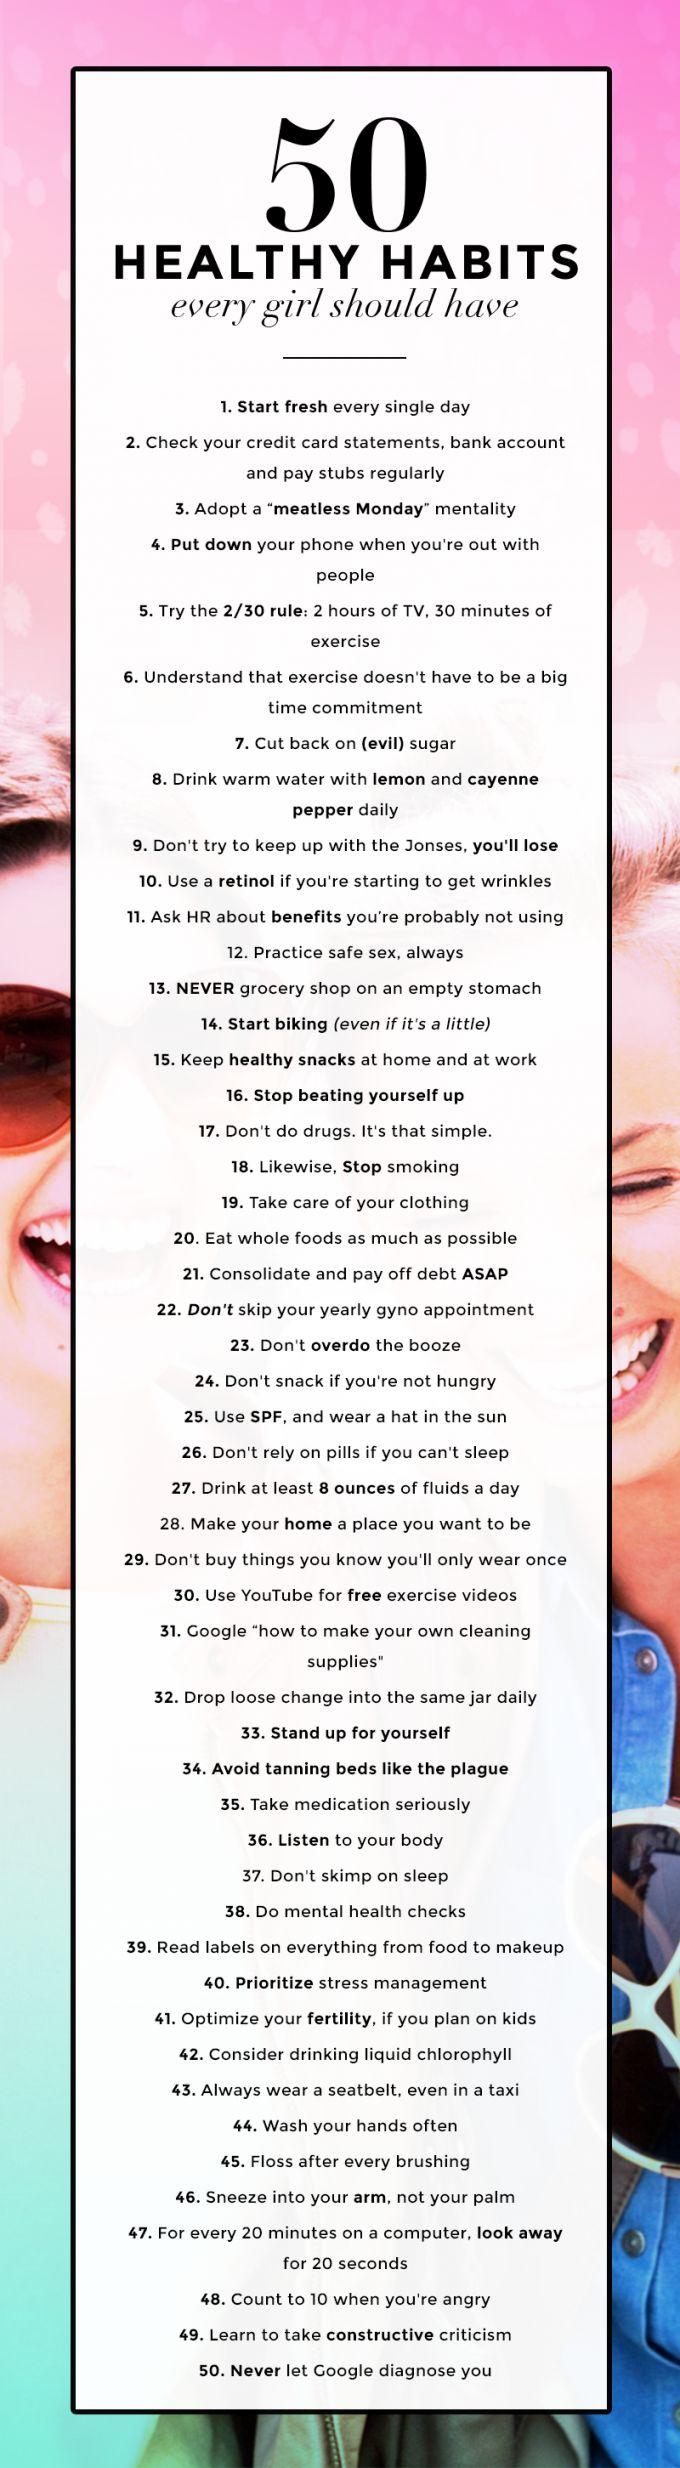 50 Healthy Habits  now up at www.dutchessroz.com